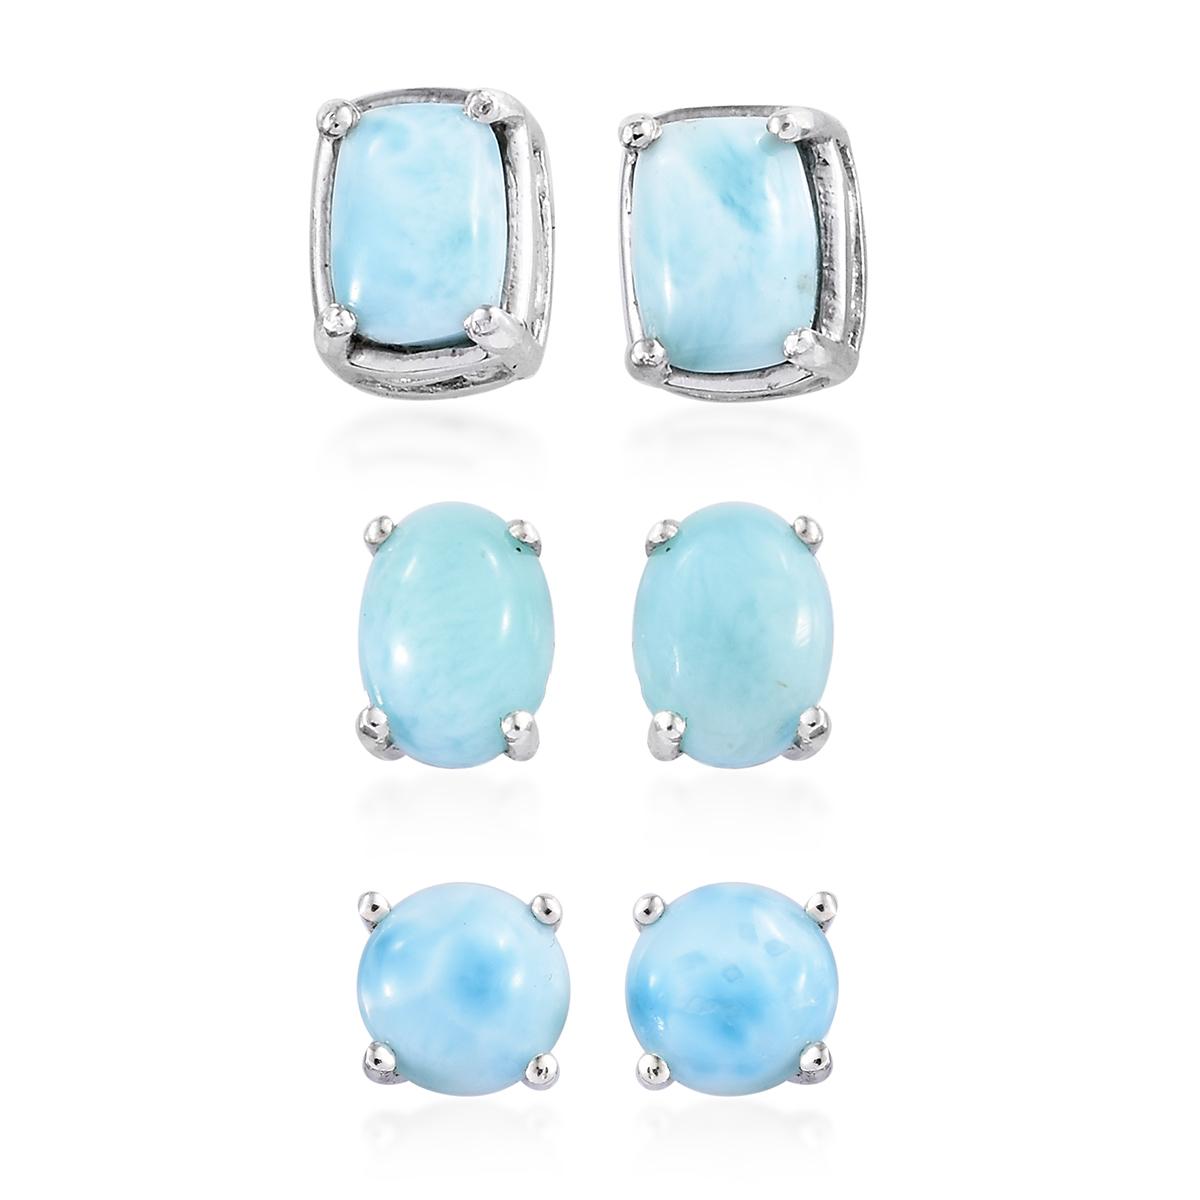 fd745e299 Set of 3 Larimar Platinum Over Sterling Silver Stud Earrings 6.91 ctw ...